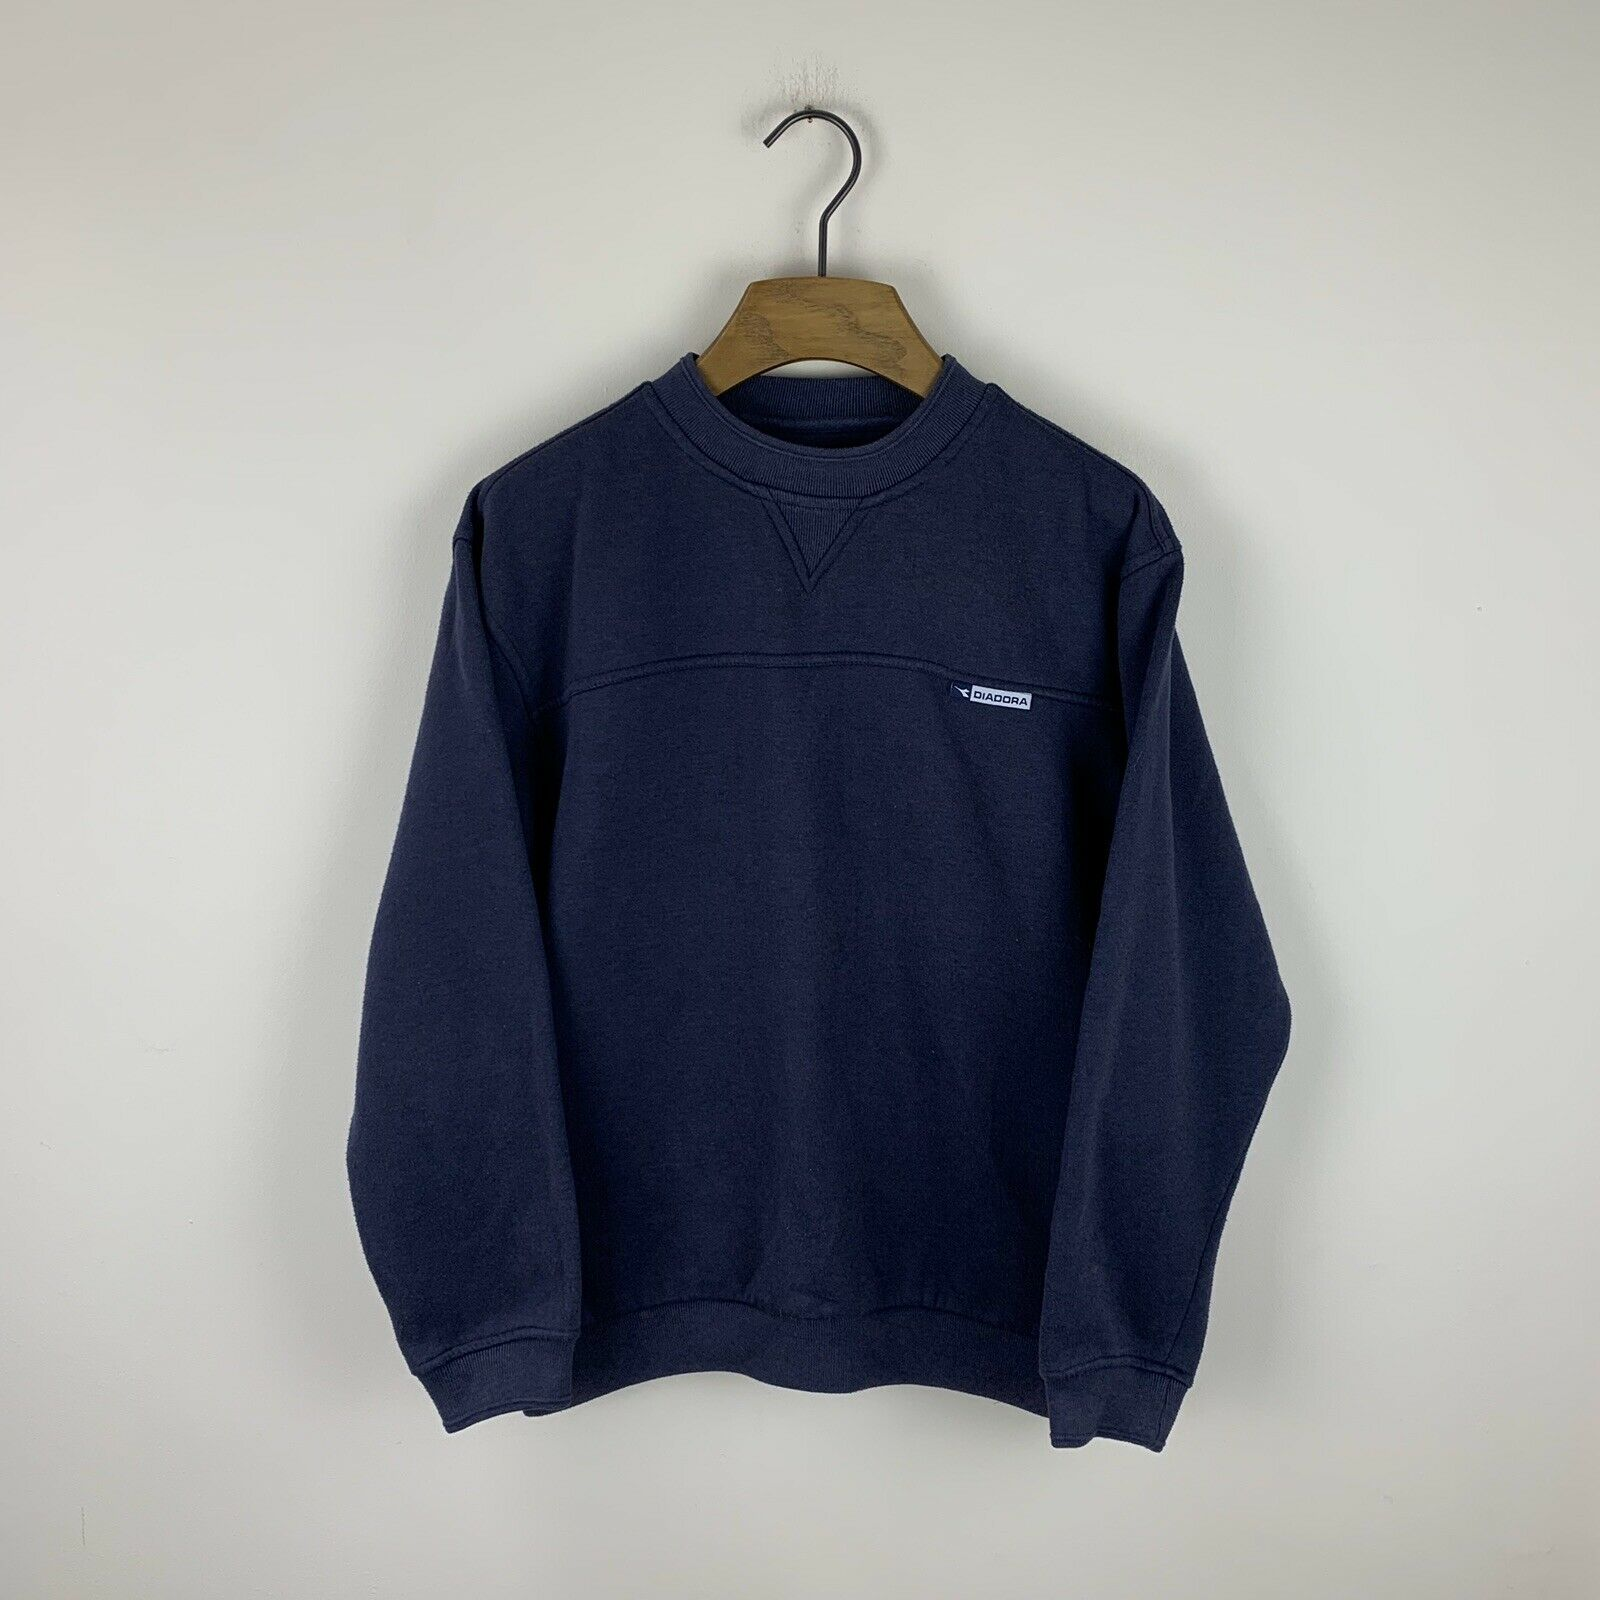 Vintage 90s Diadora Crew Neck Sweatshirt Size Men's Small